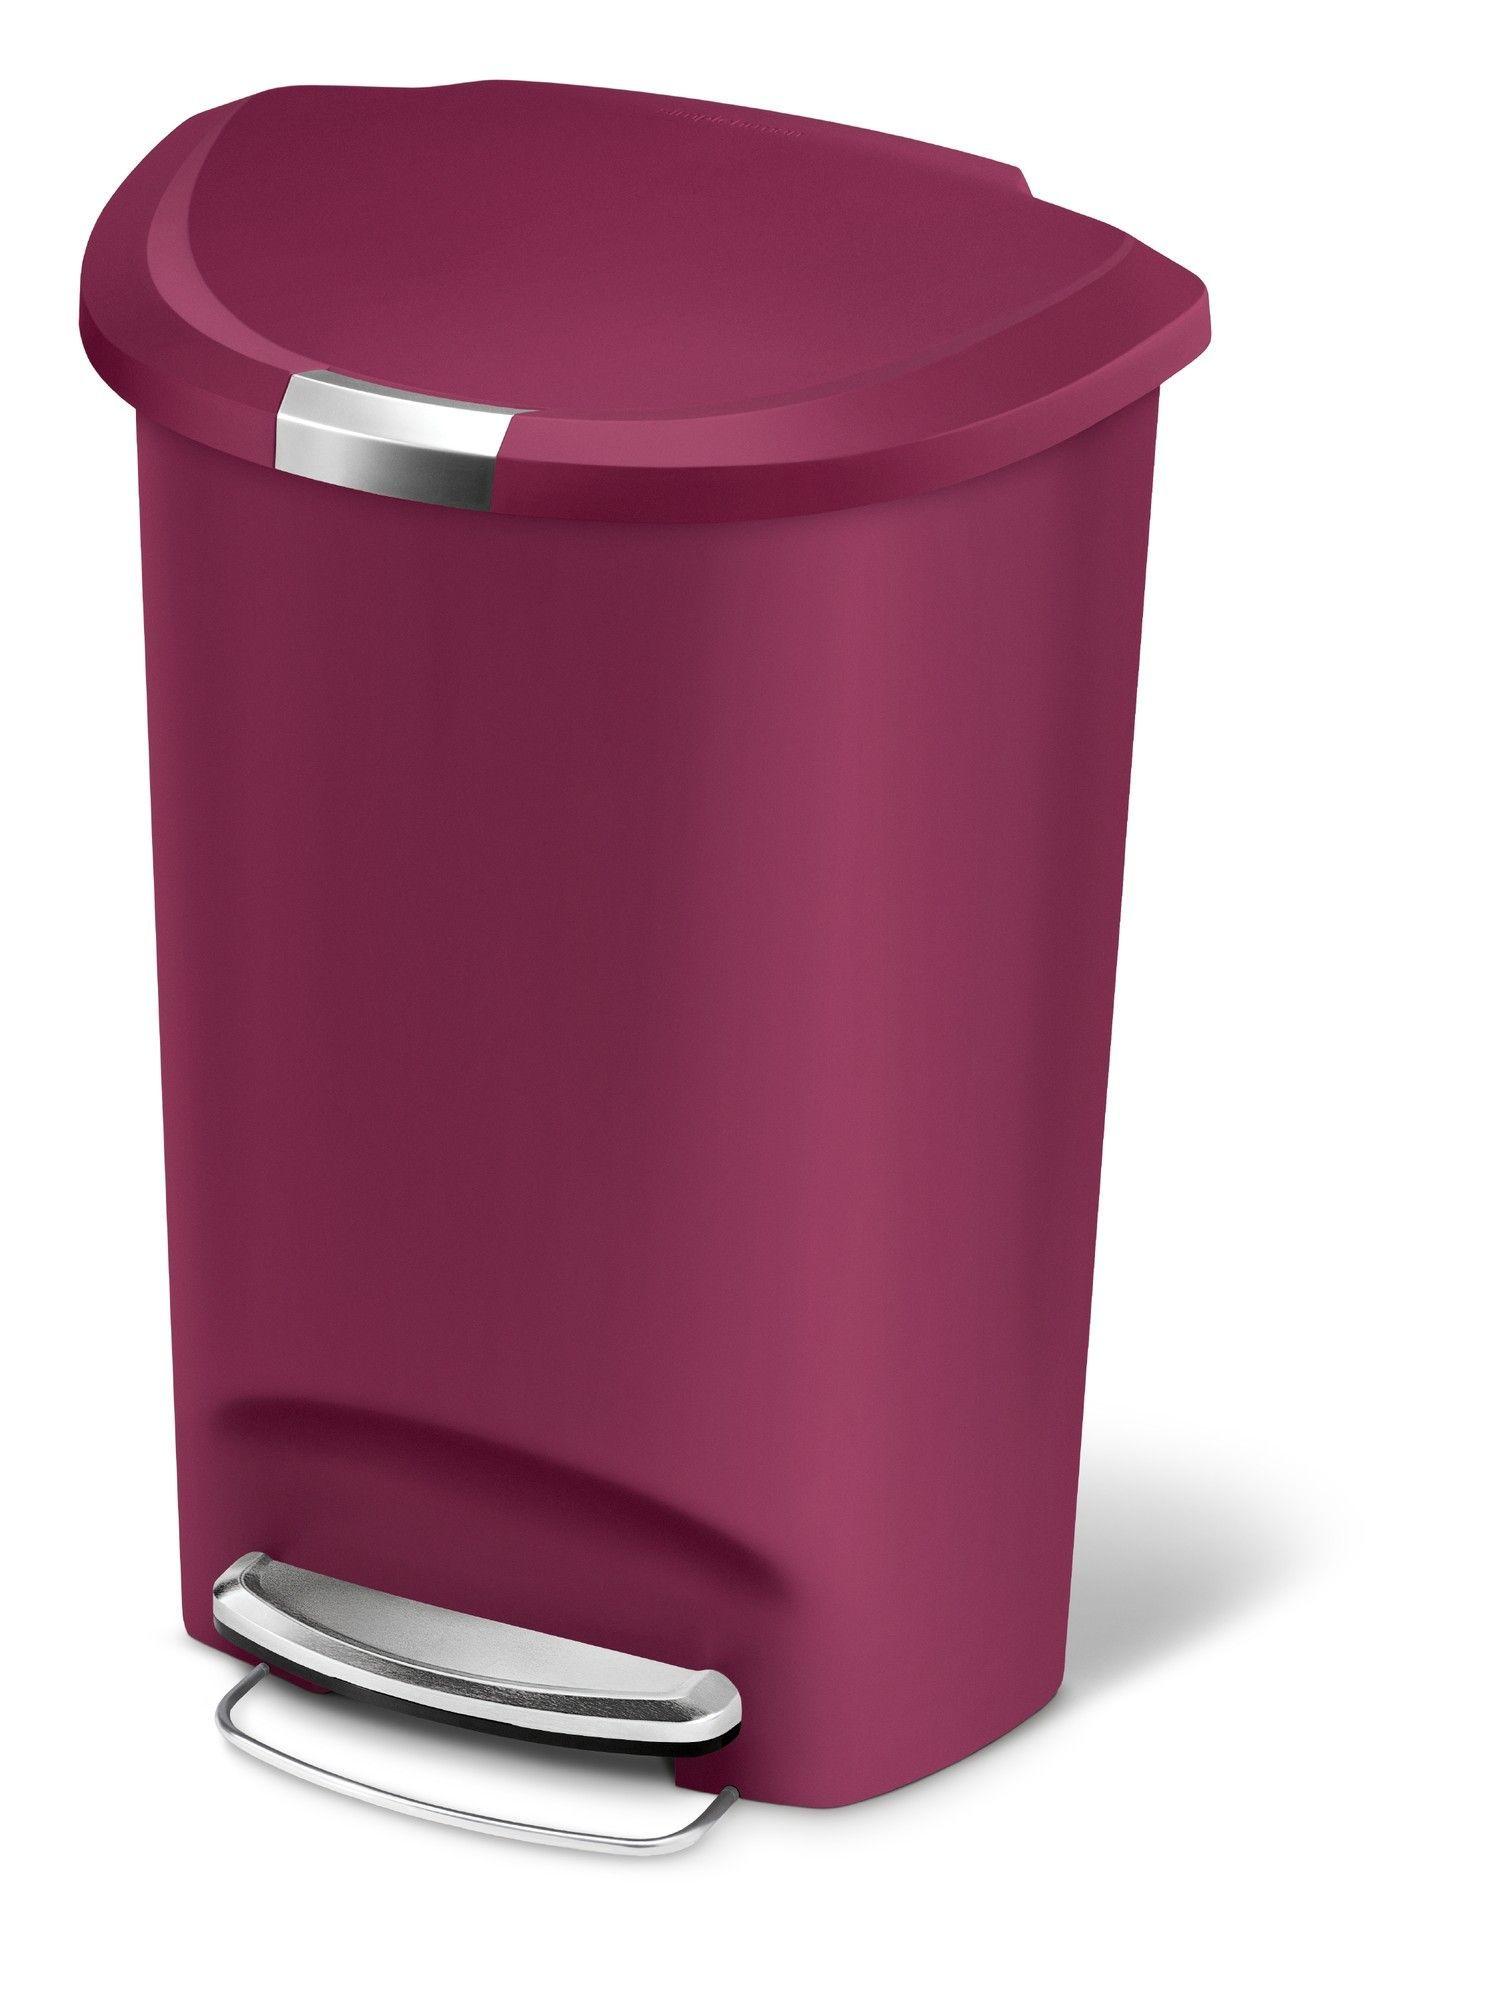 Simplehuman Plastic Step On 13 Gallon Trash Can Trash Can Simplehuman Kitchen Trash Cans Simple human trash can 13 gallon